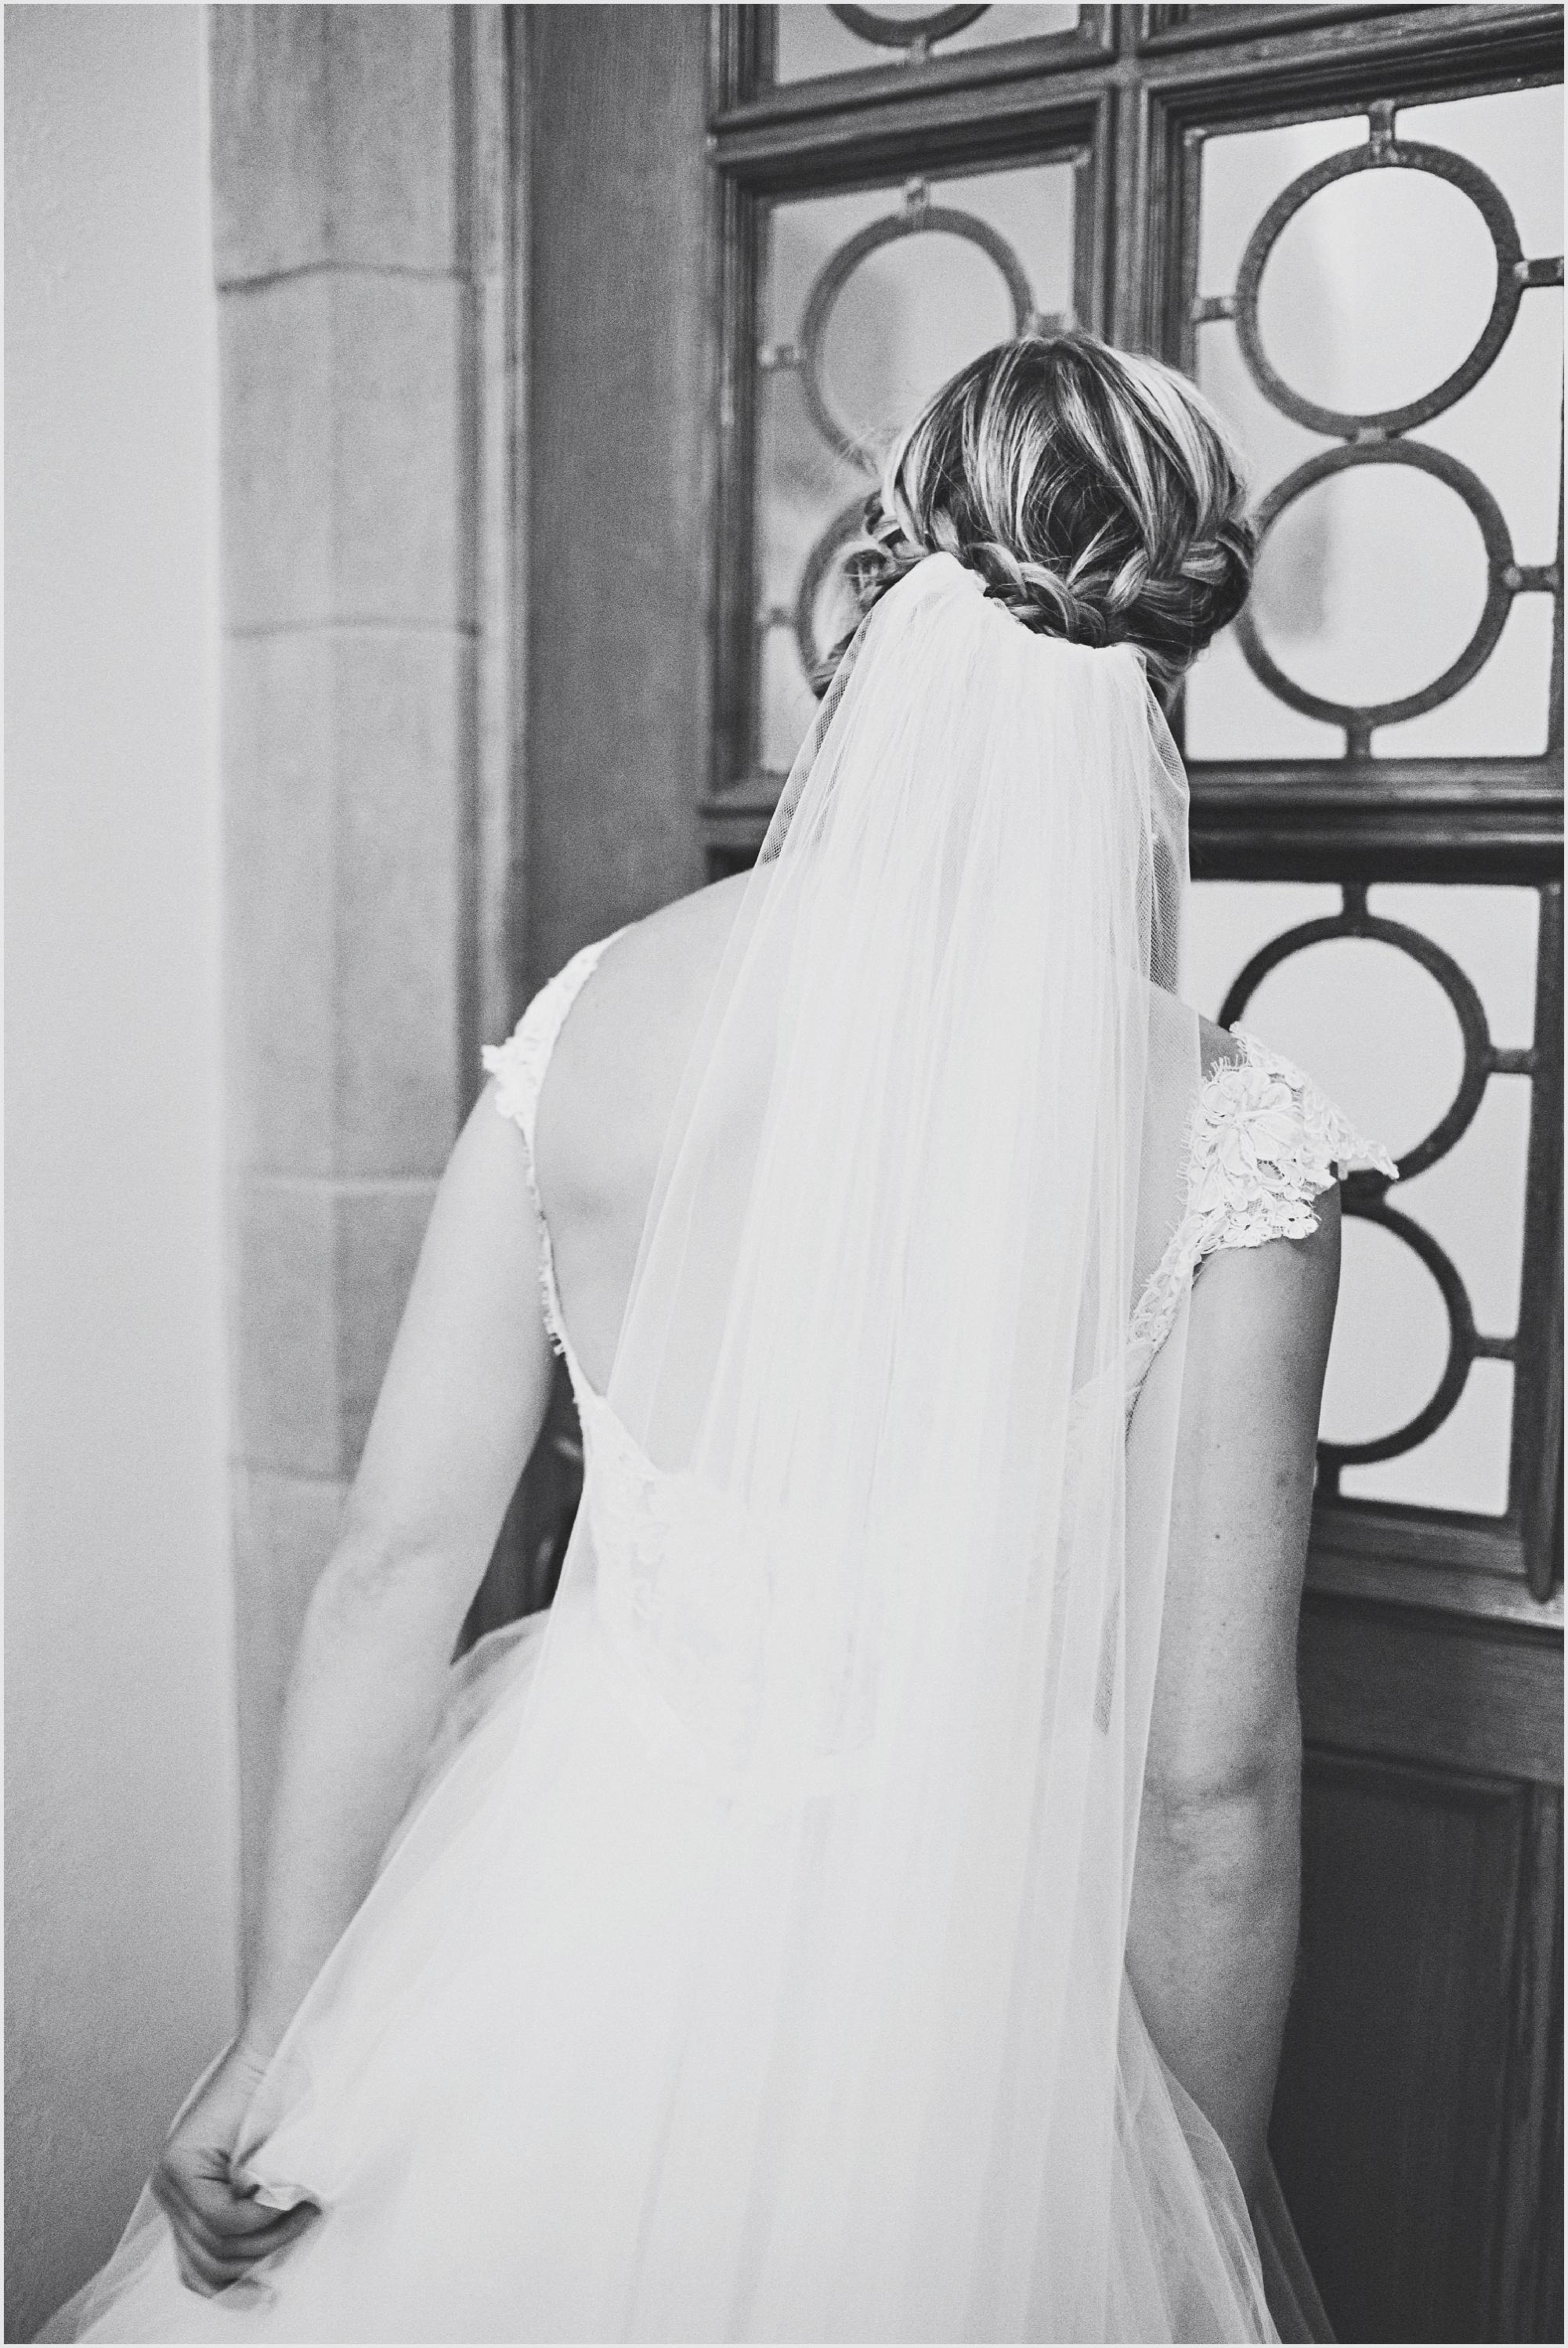 maura_david_james_j_hill_wedding_lucas_botz_photography_013.jpg